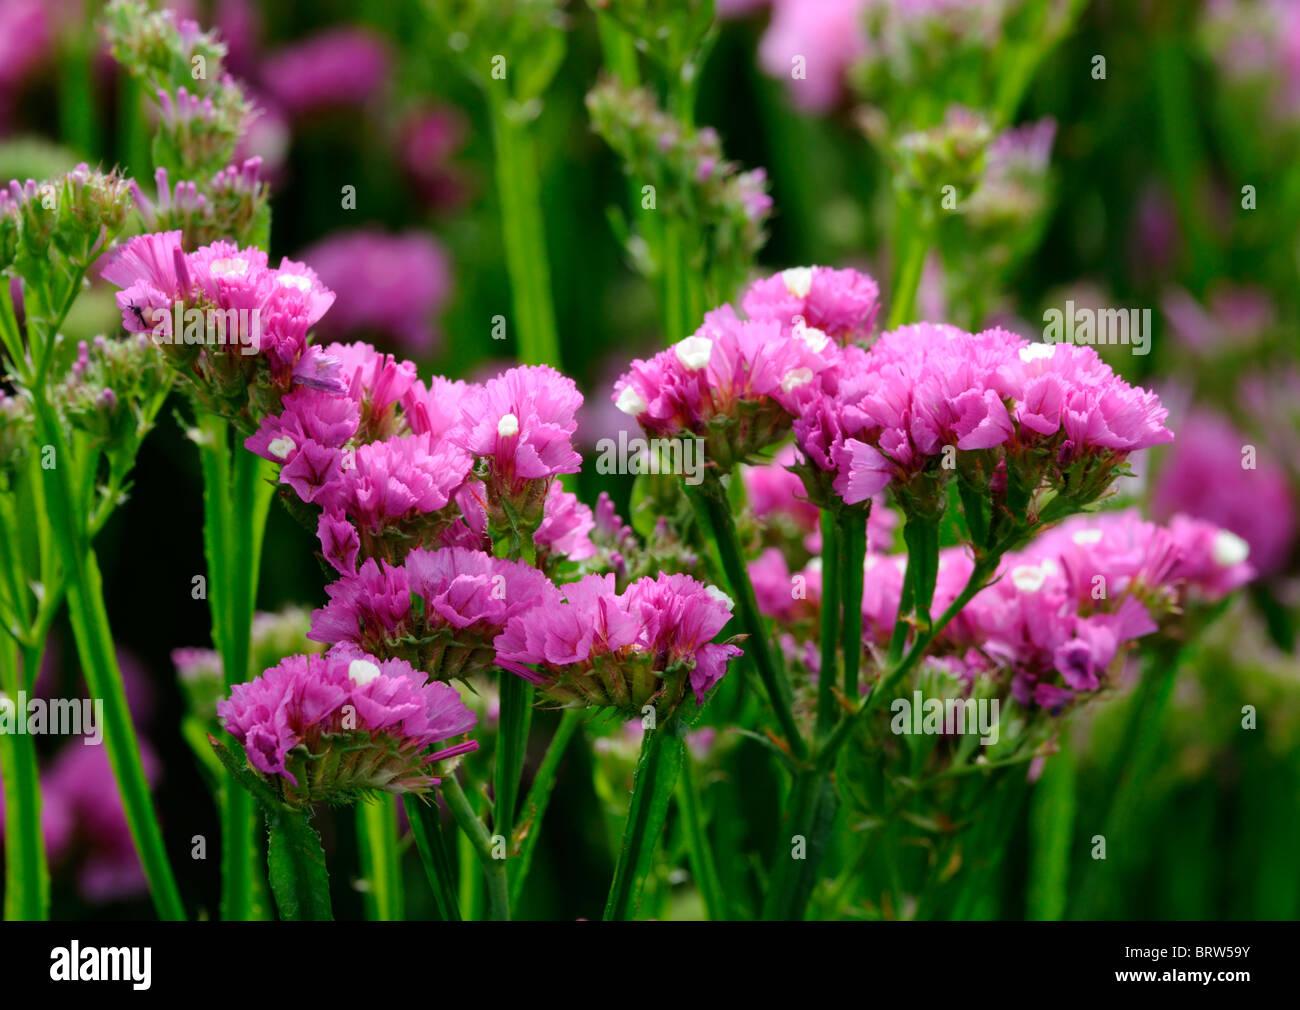 Statice sinuata Sunburst rose Limonium pink flowers bloom blossom Stock